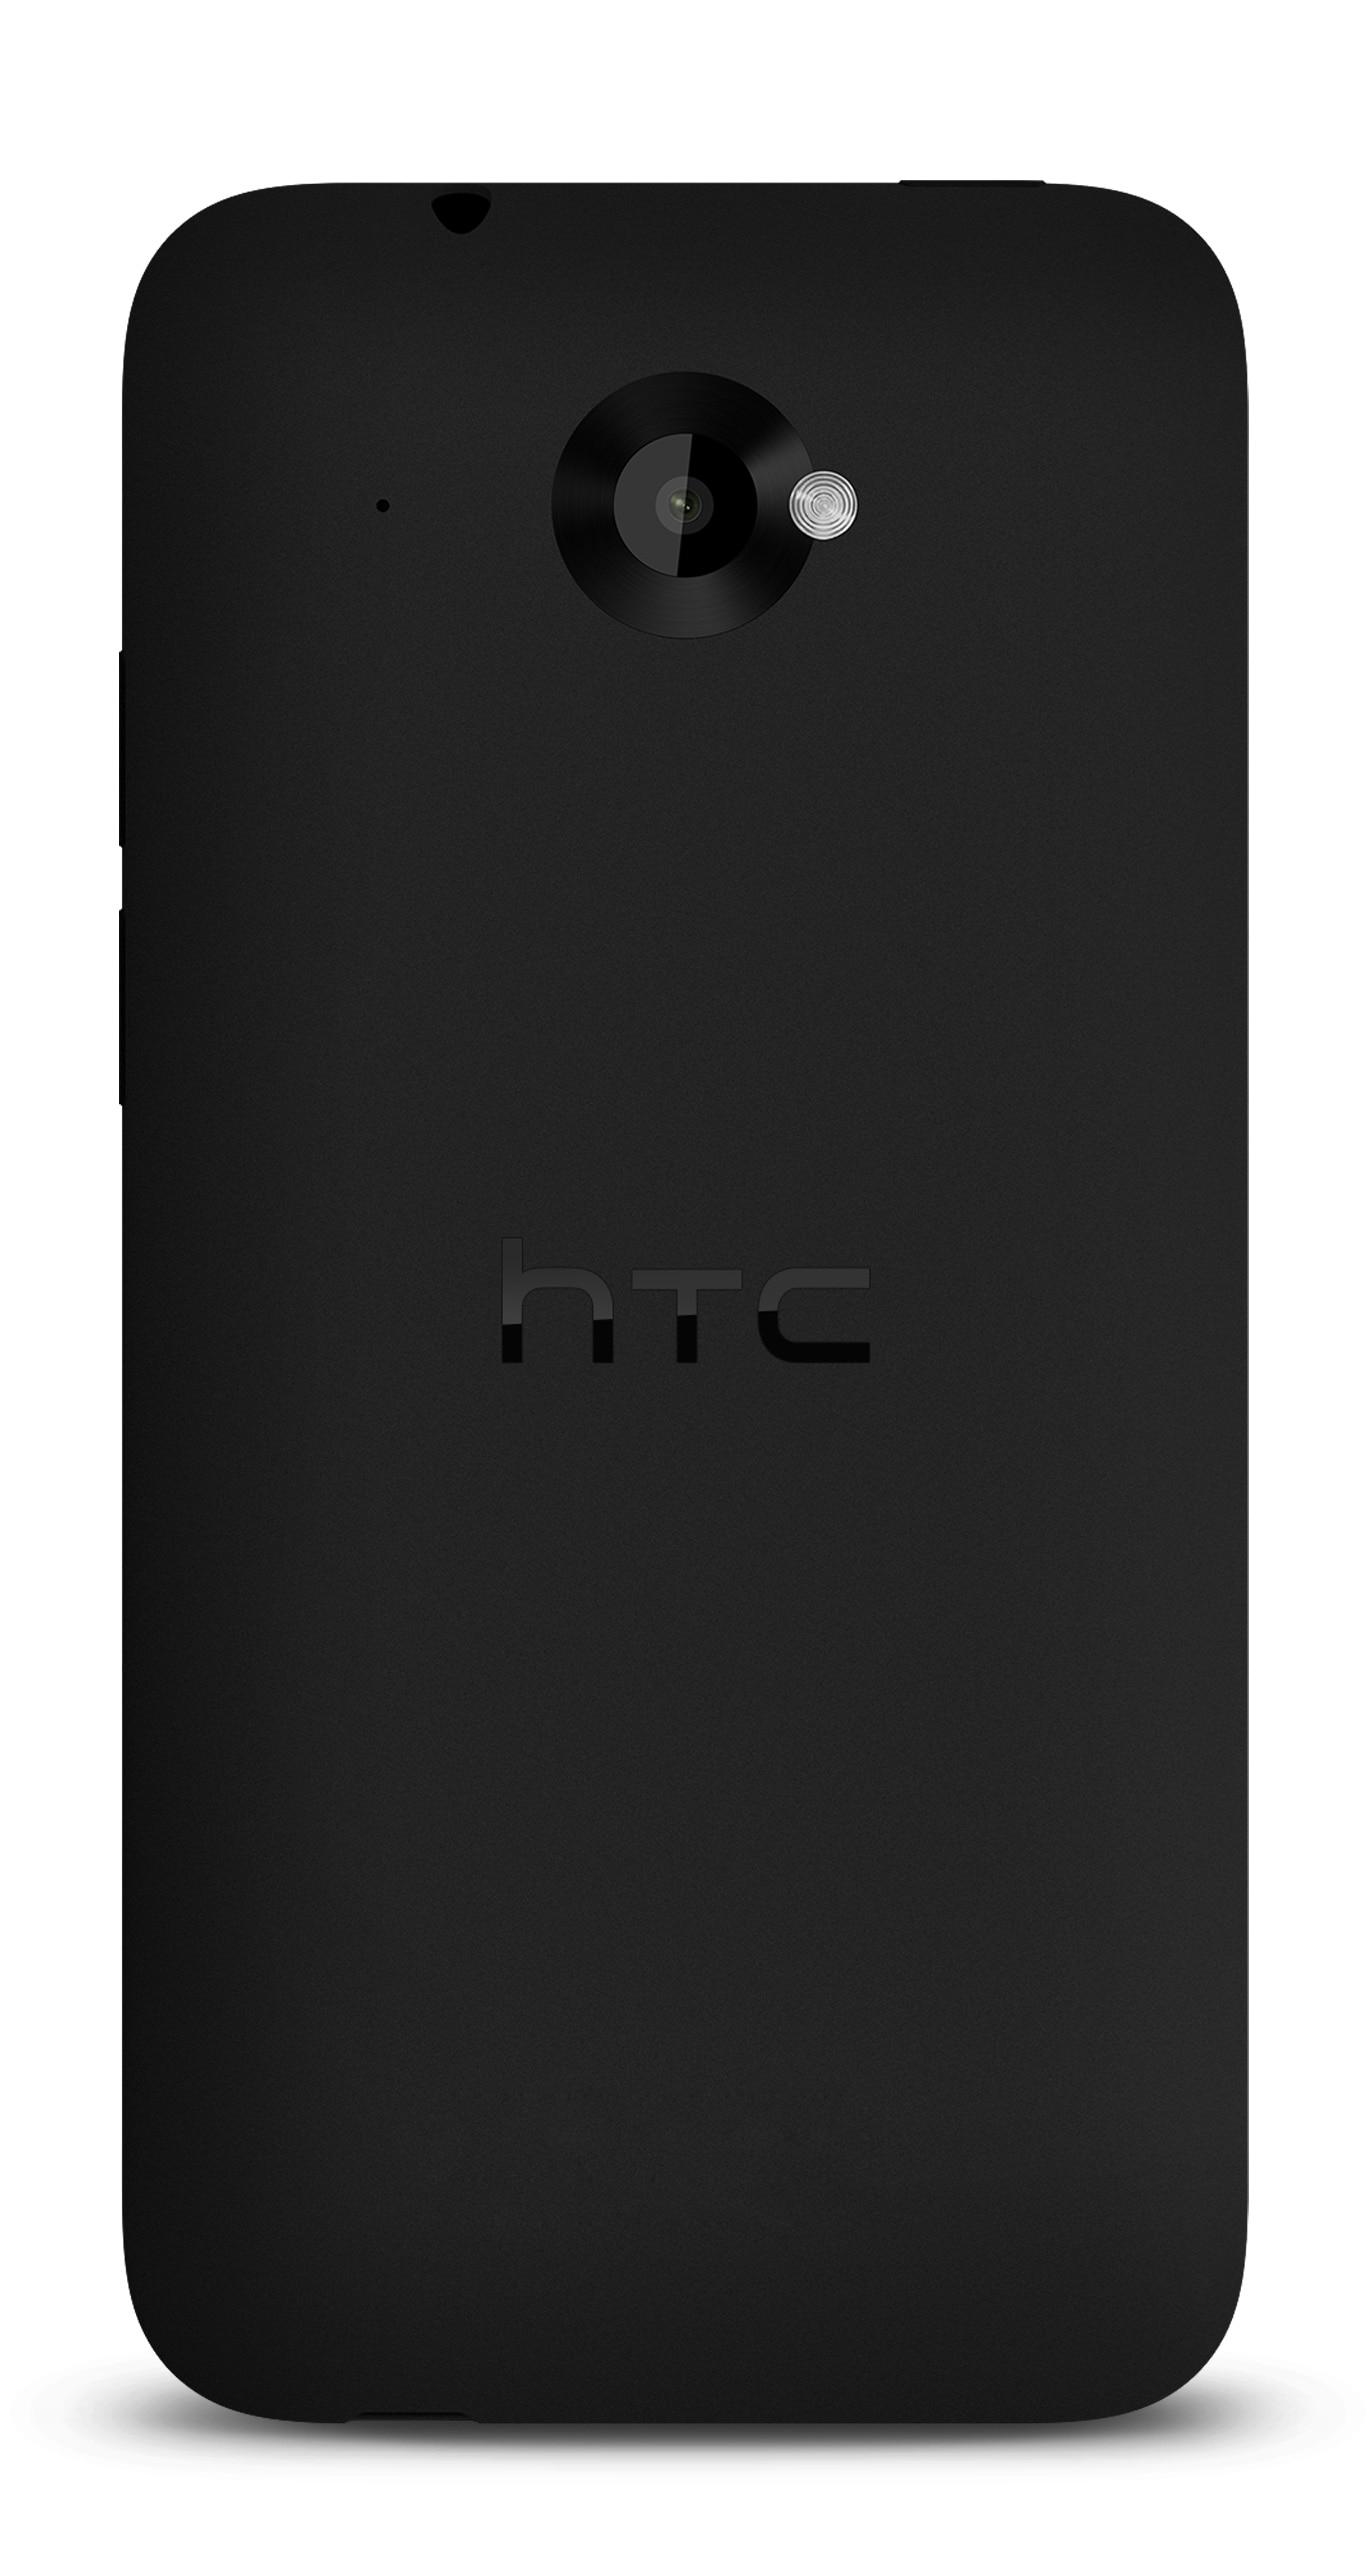 Htc one 601 dual sim - b